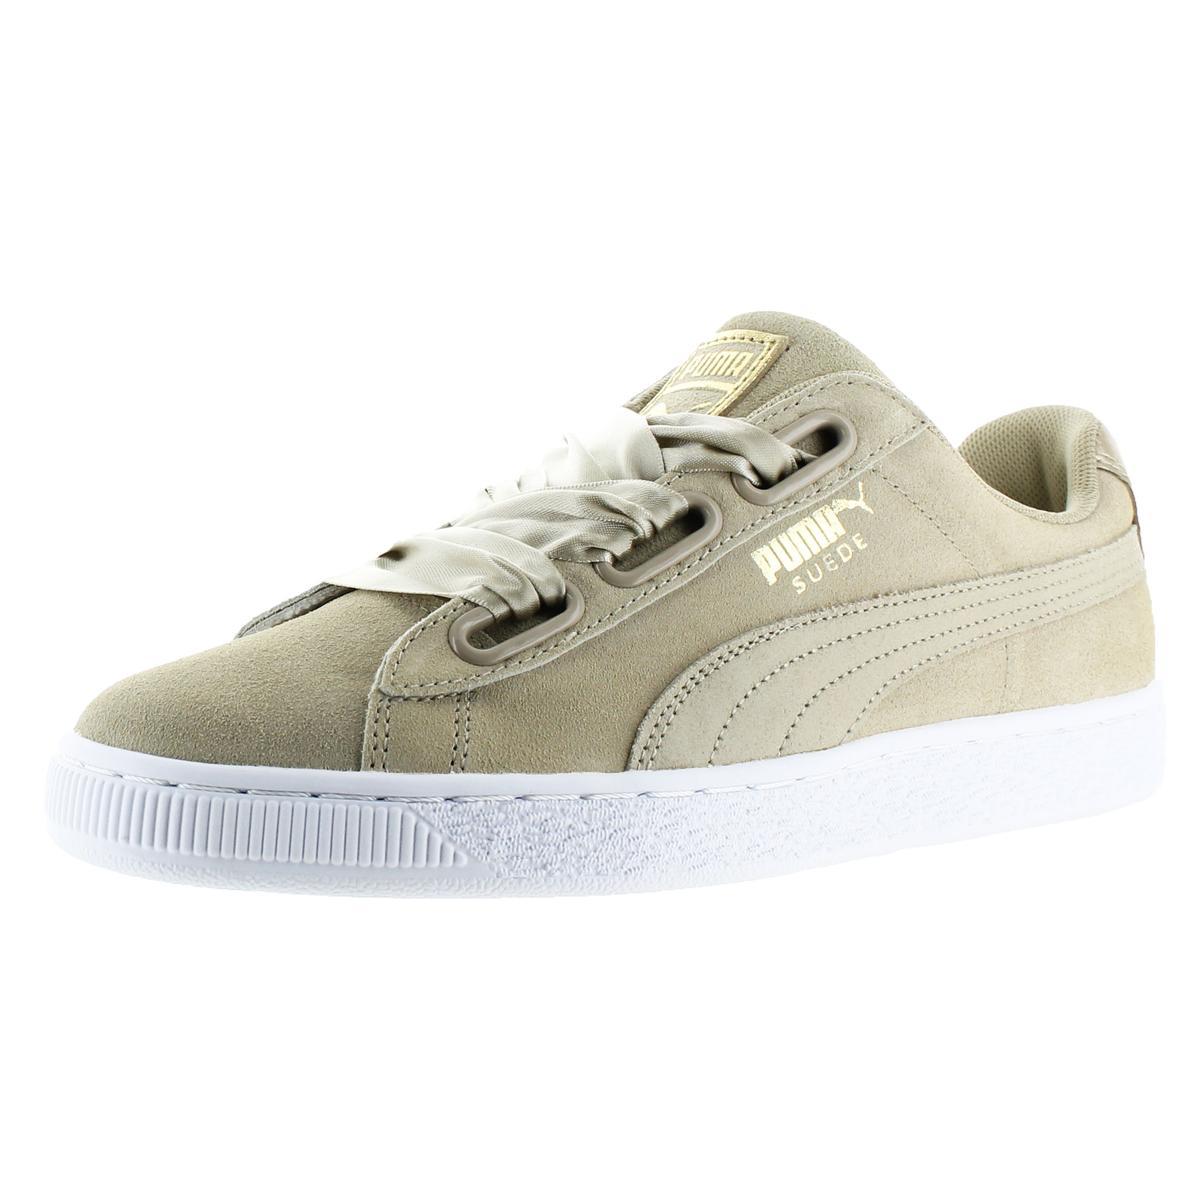 a0944fc8d27474 Details about Puma Suede Heart Safari Women s Satin Bow Lace-Up Athletic  Fashion Sneaker Shoe